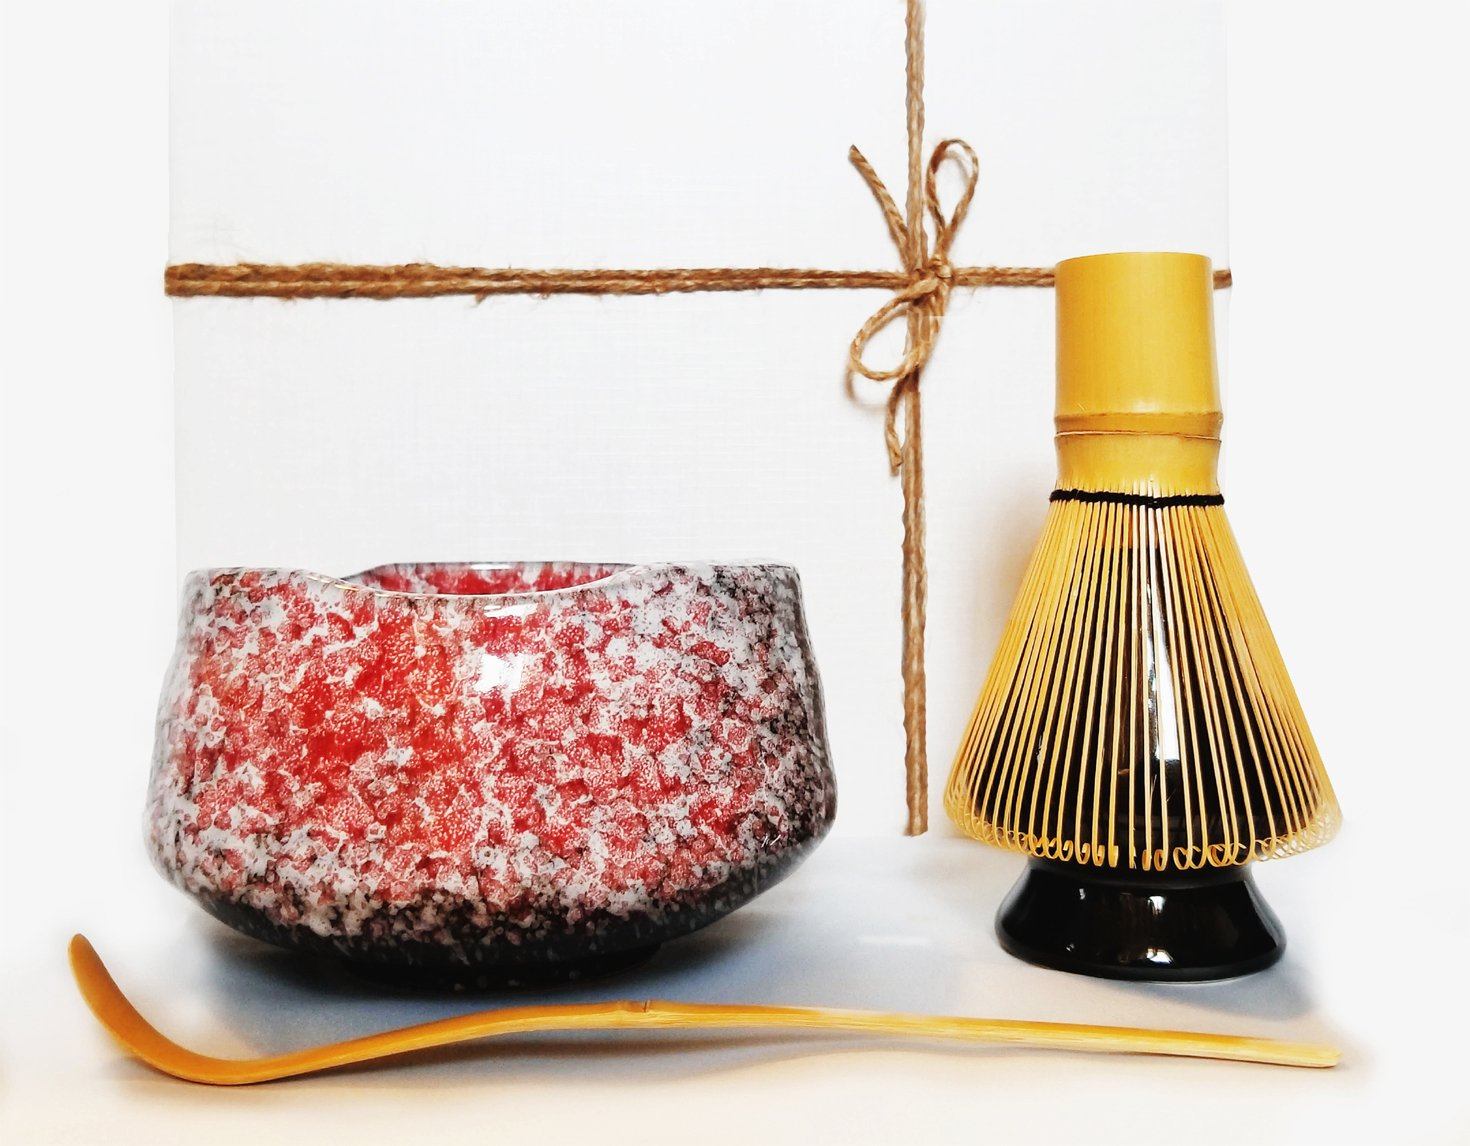 HARU MATCHA - Complete Yozakura Matcha Tea Ceremony Gift Set - Matcha Bowl (Chawan), Bamboo Scoop (Chashaku), Bamboo Whisk (100 tate), and Whisk Holder by Haru Matcha